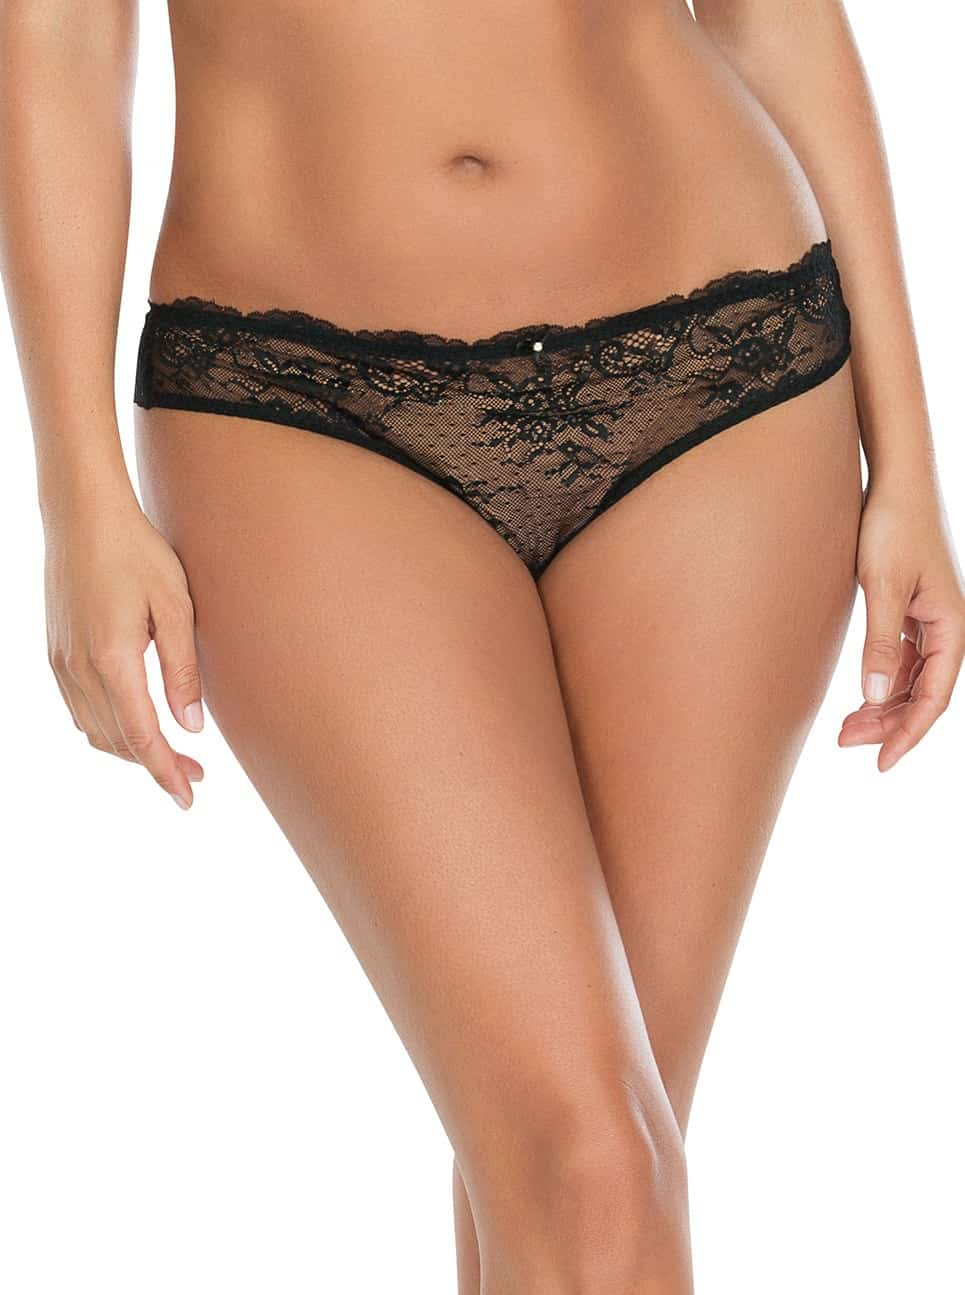 Sandrine BrazilianThongP5354 Black Front - Sandrine Brazilian Thong - Black - P5354